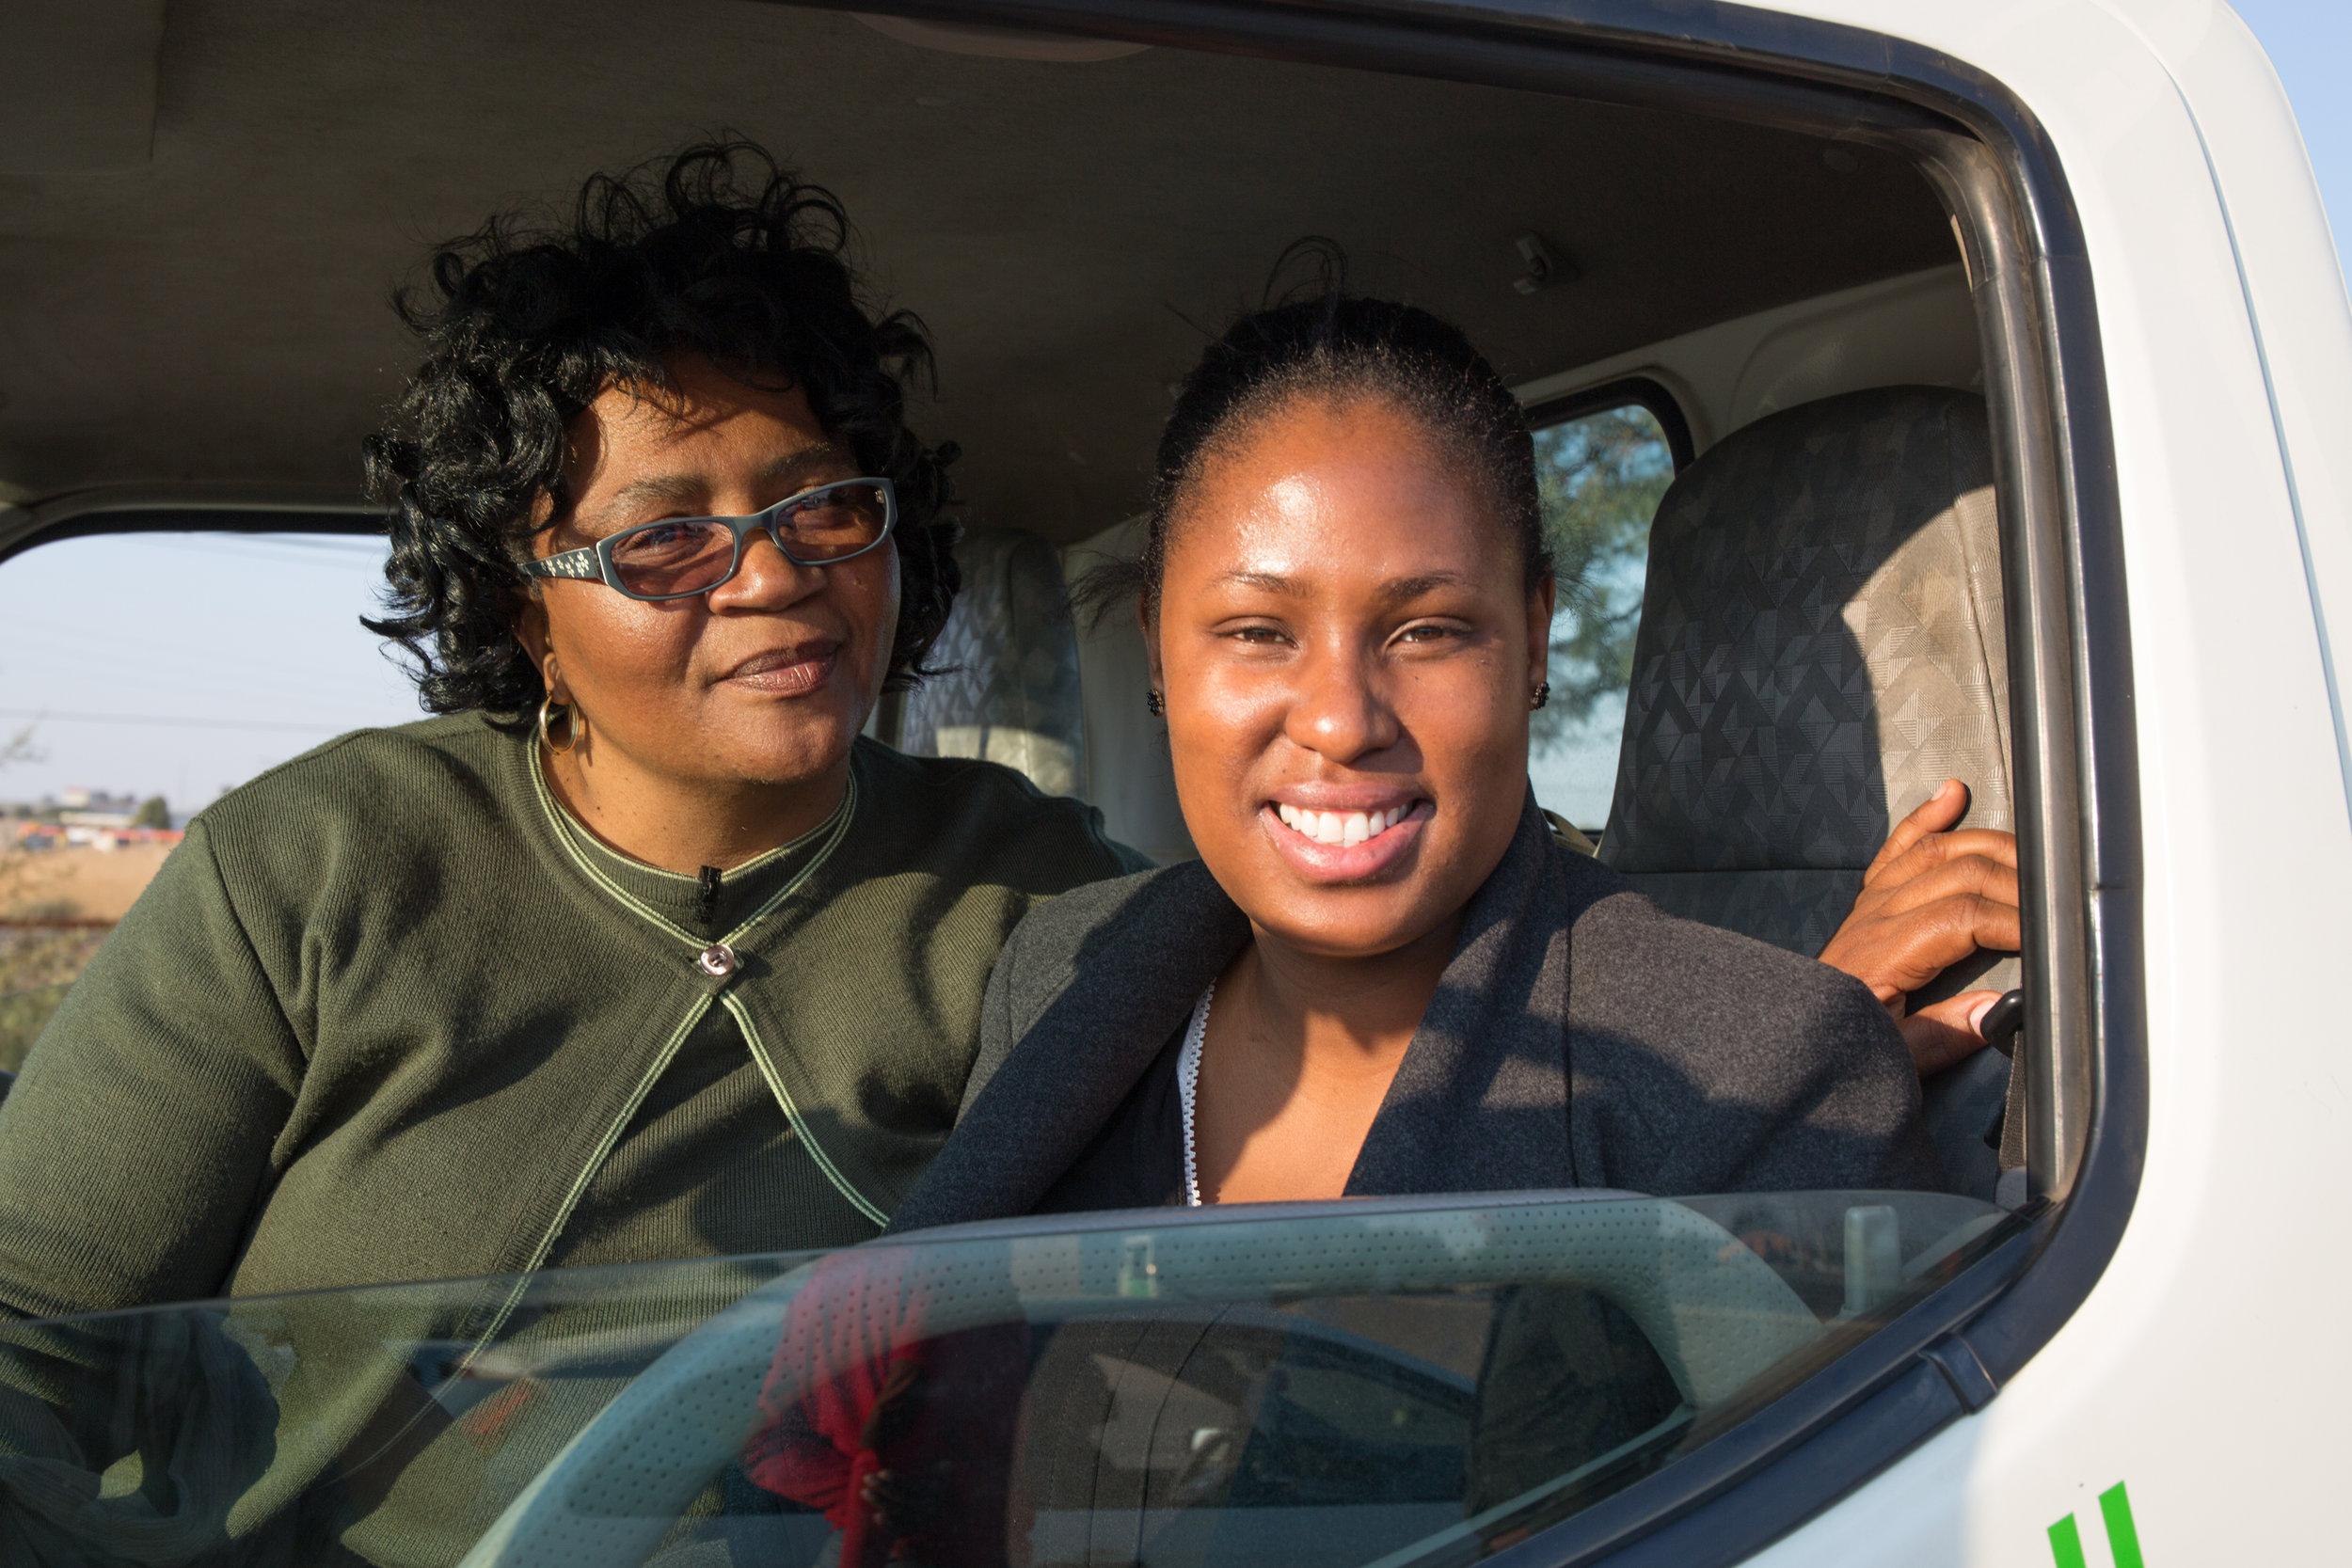 FM_Partnership_ResponsibleSourcing_Website_FemaleDrivingSchoolImage.jpg